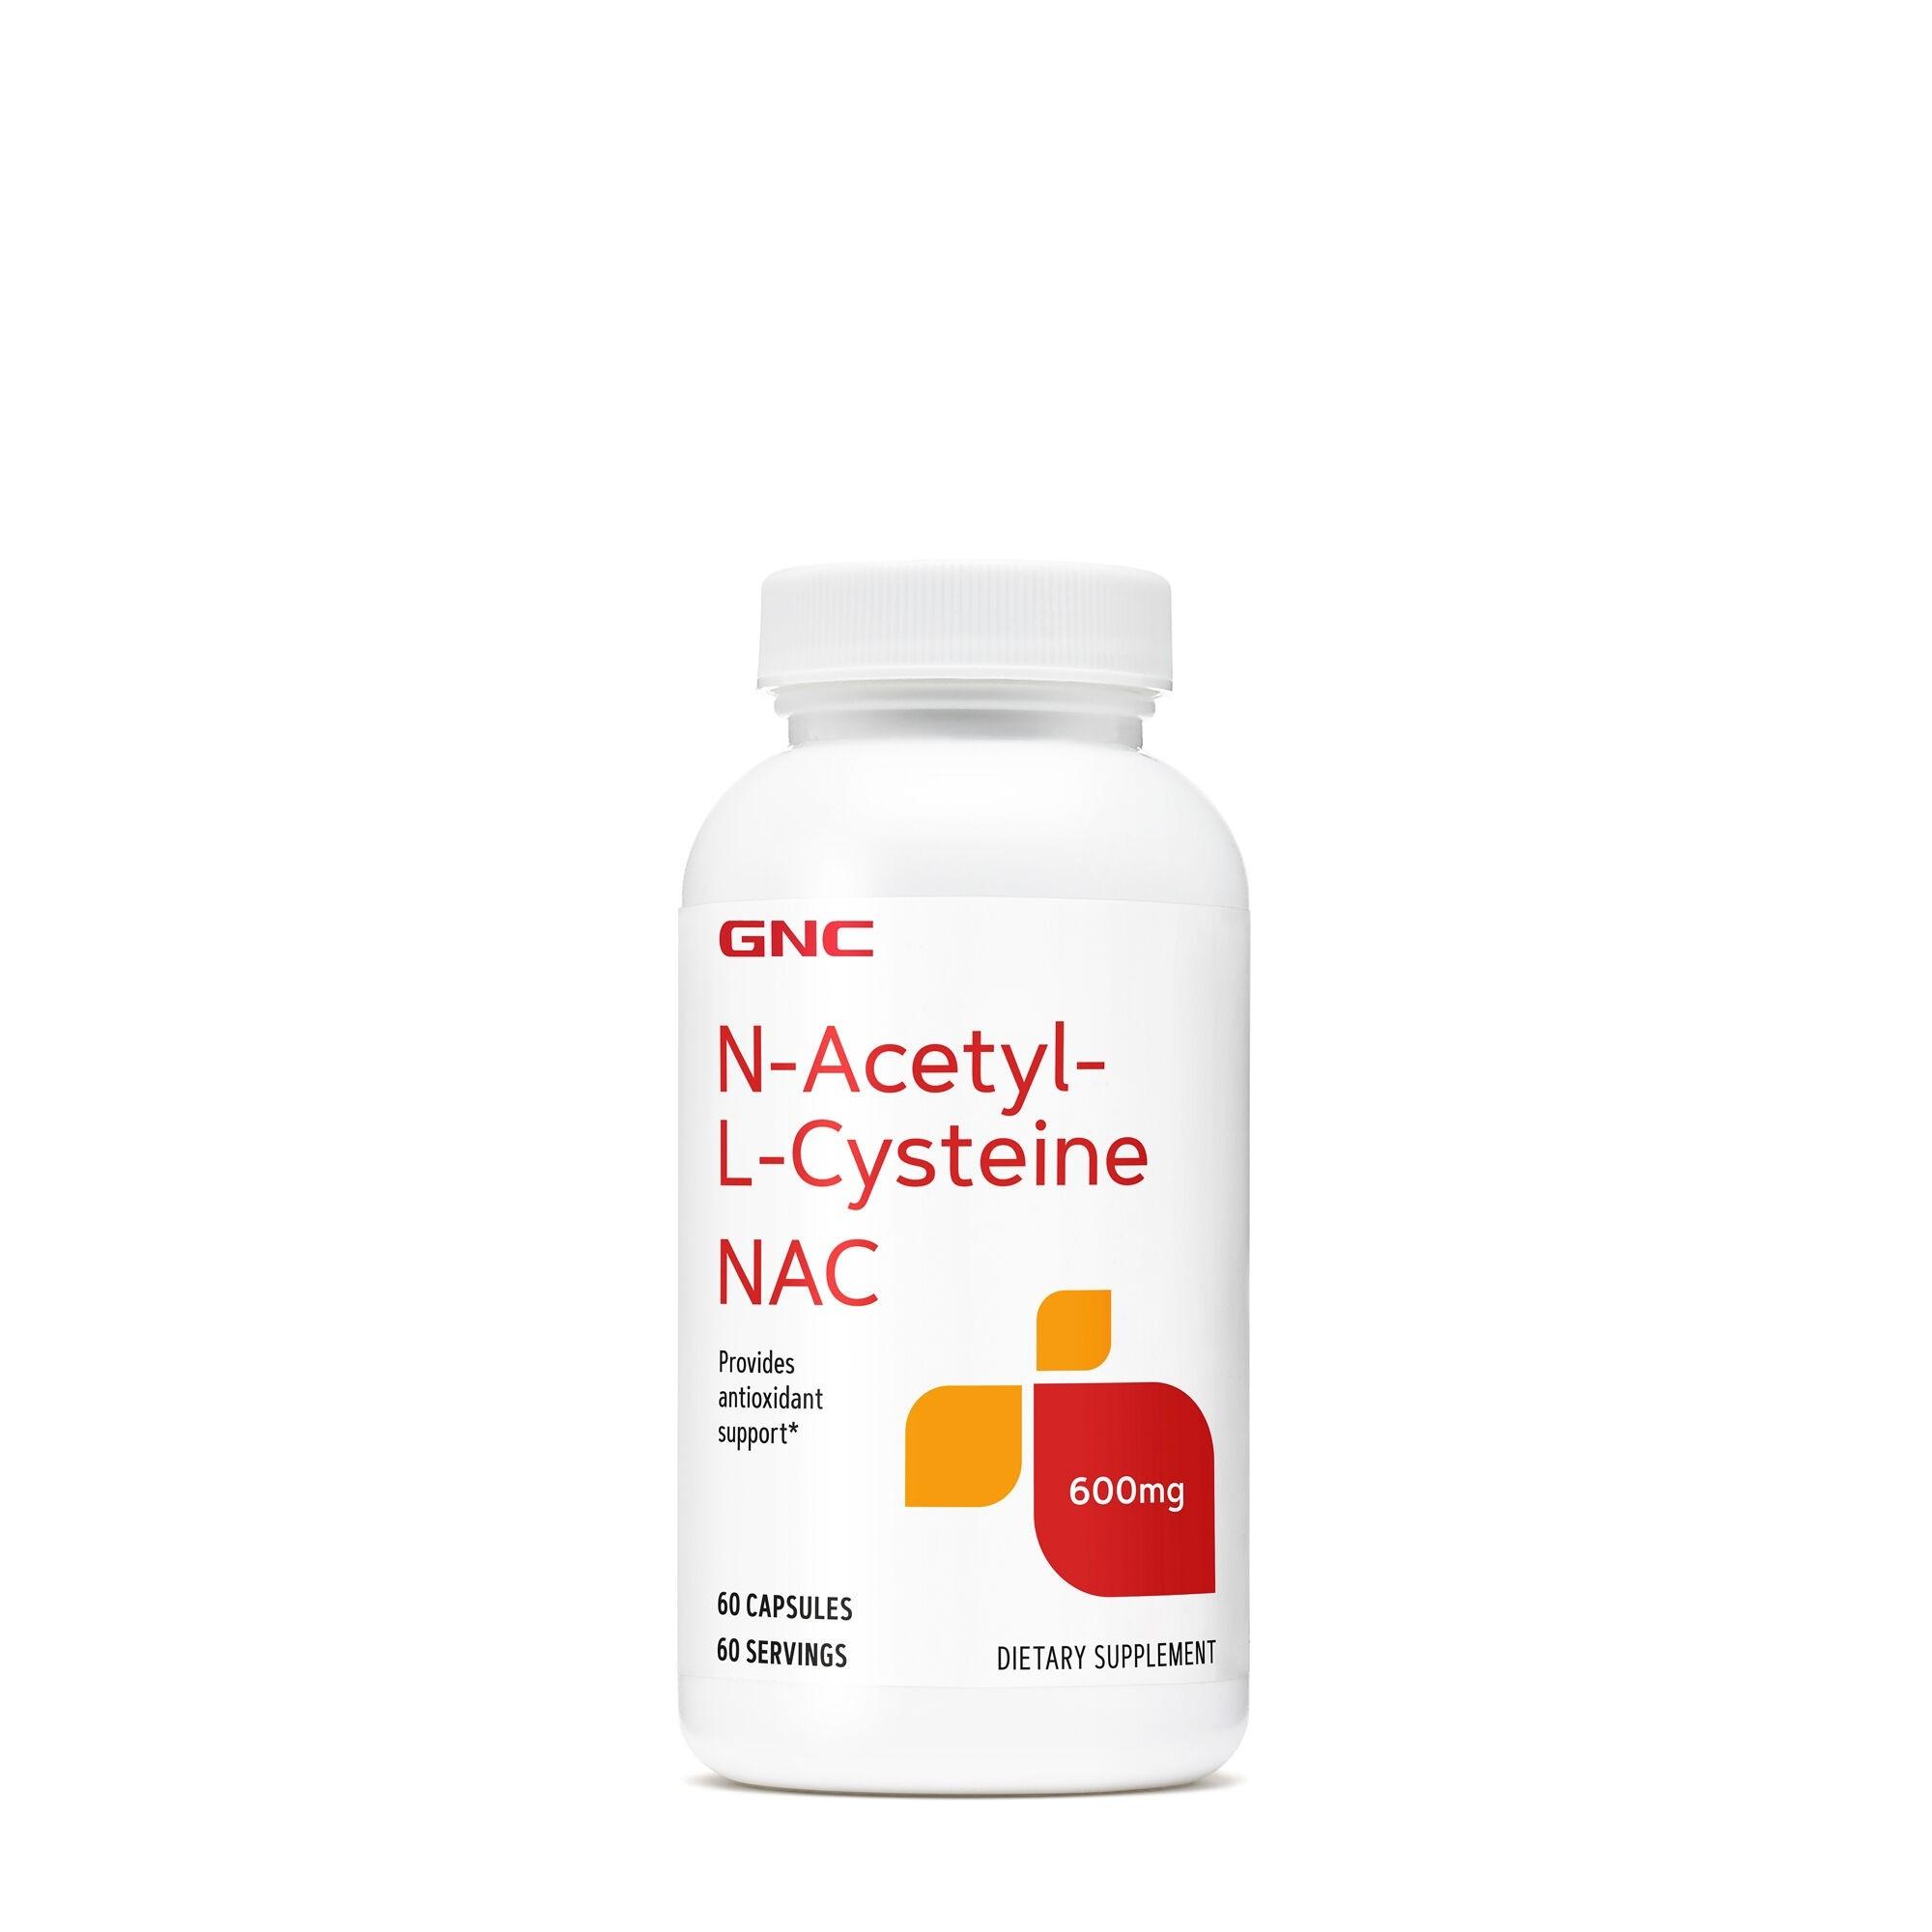 GNC N-Acetyl-L-Cysteine (NAC) - 600 mg, Antioxidant N-Acetil-L-Cisteina, 60 cps